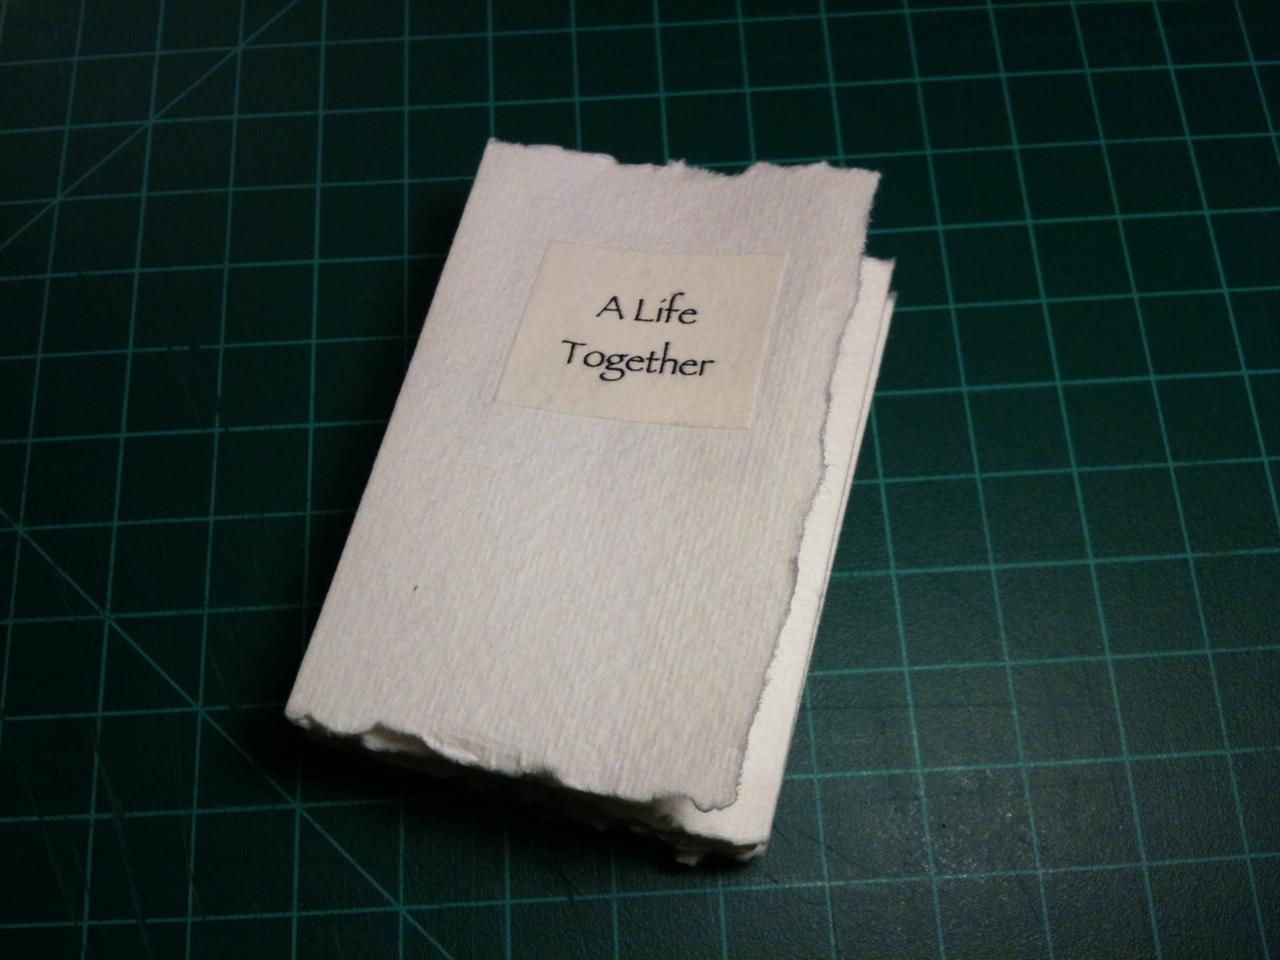 20111212-bookbinding-IMG_0483.jpg